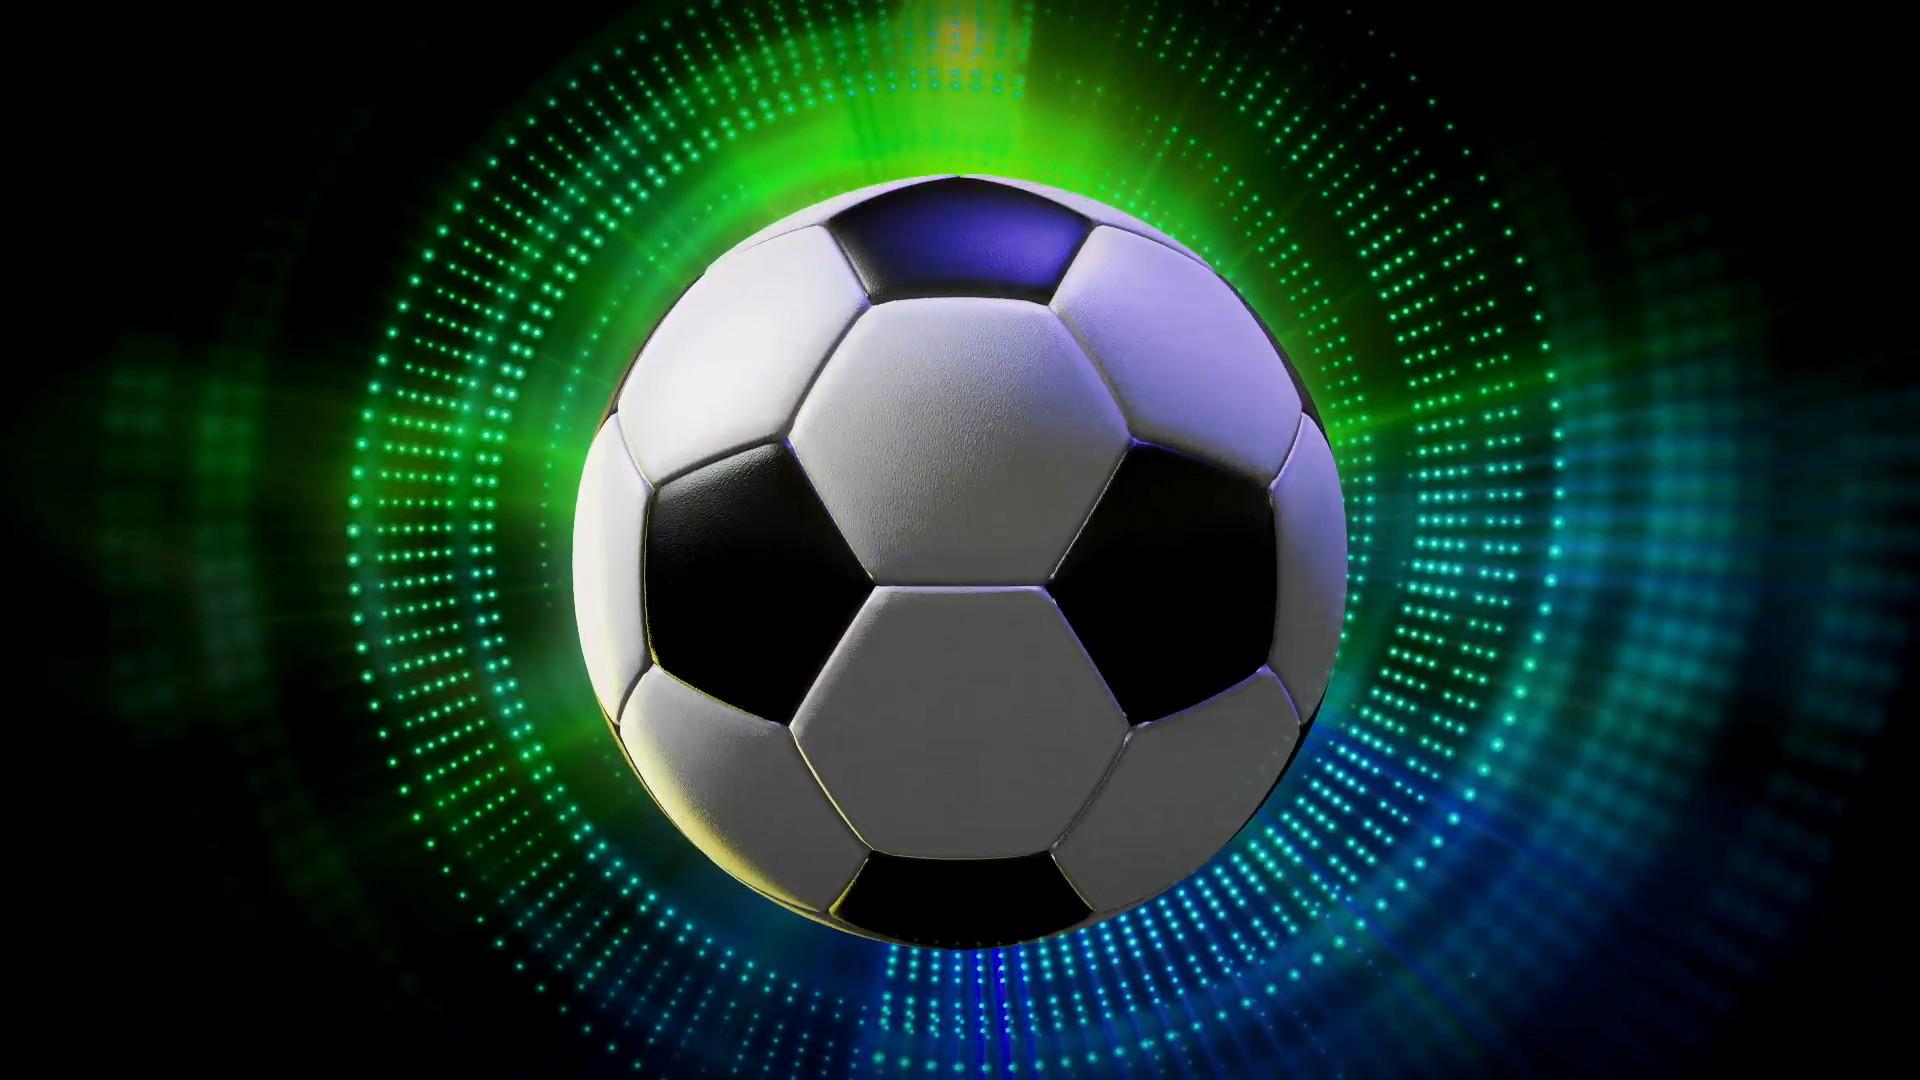 3d Sports Backgrounds: Soccer Background Images (39+ Images